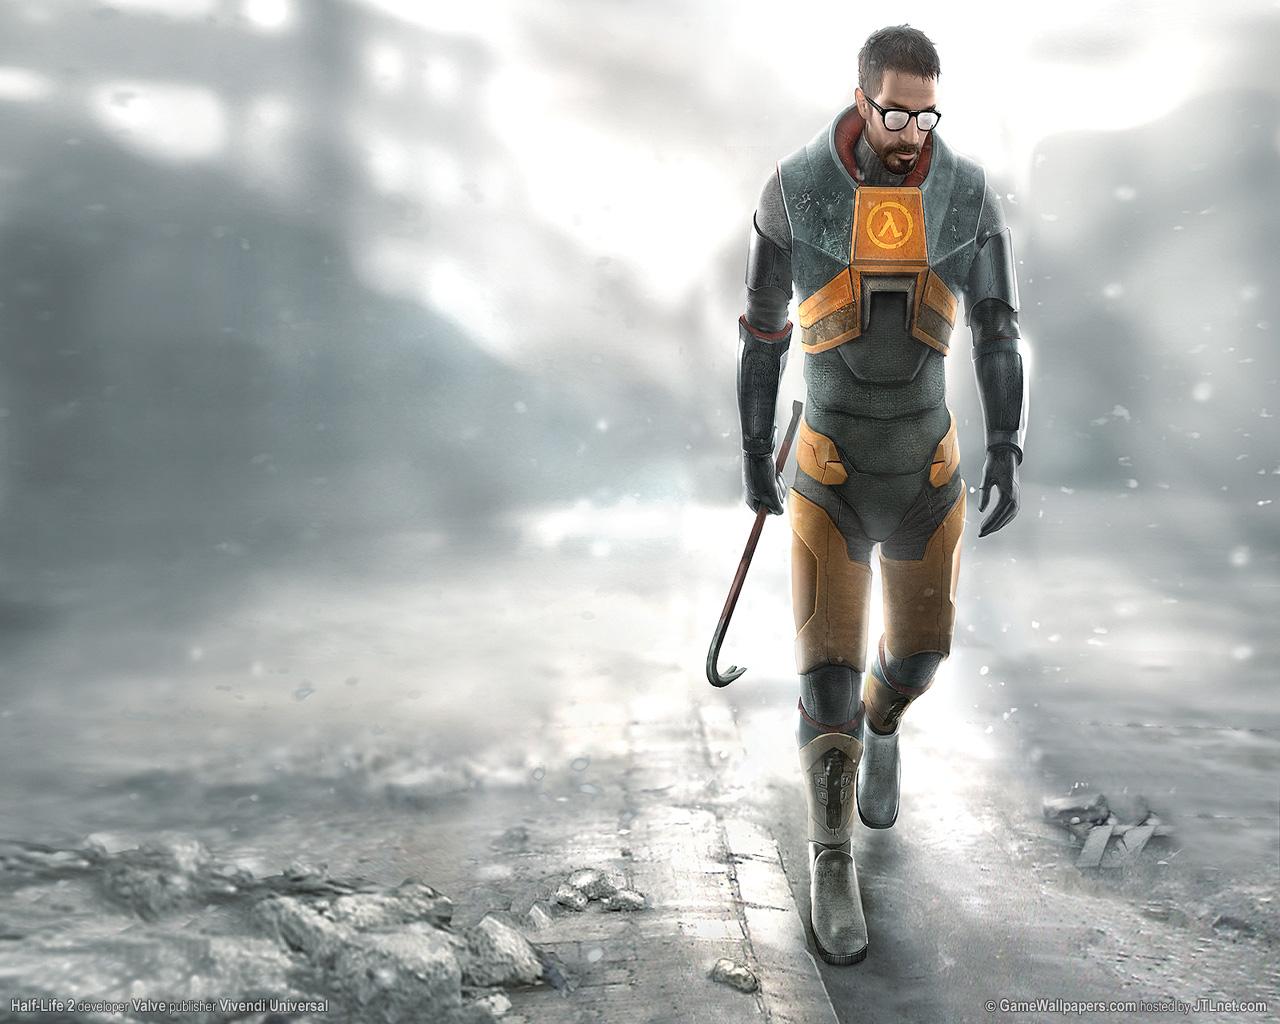 Valve no se atreve: Aun no está preparada para lanzar Episodio 3